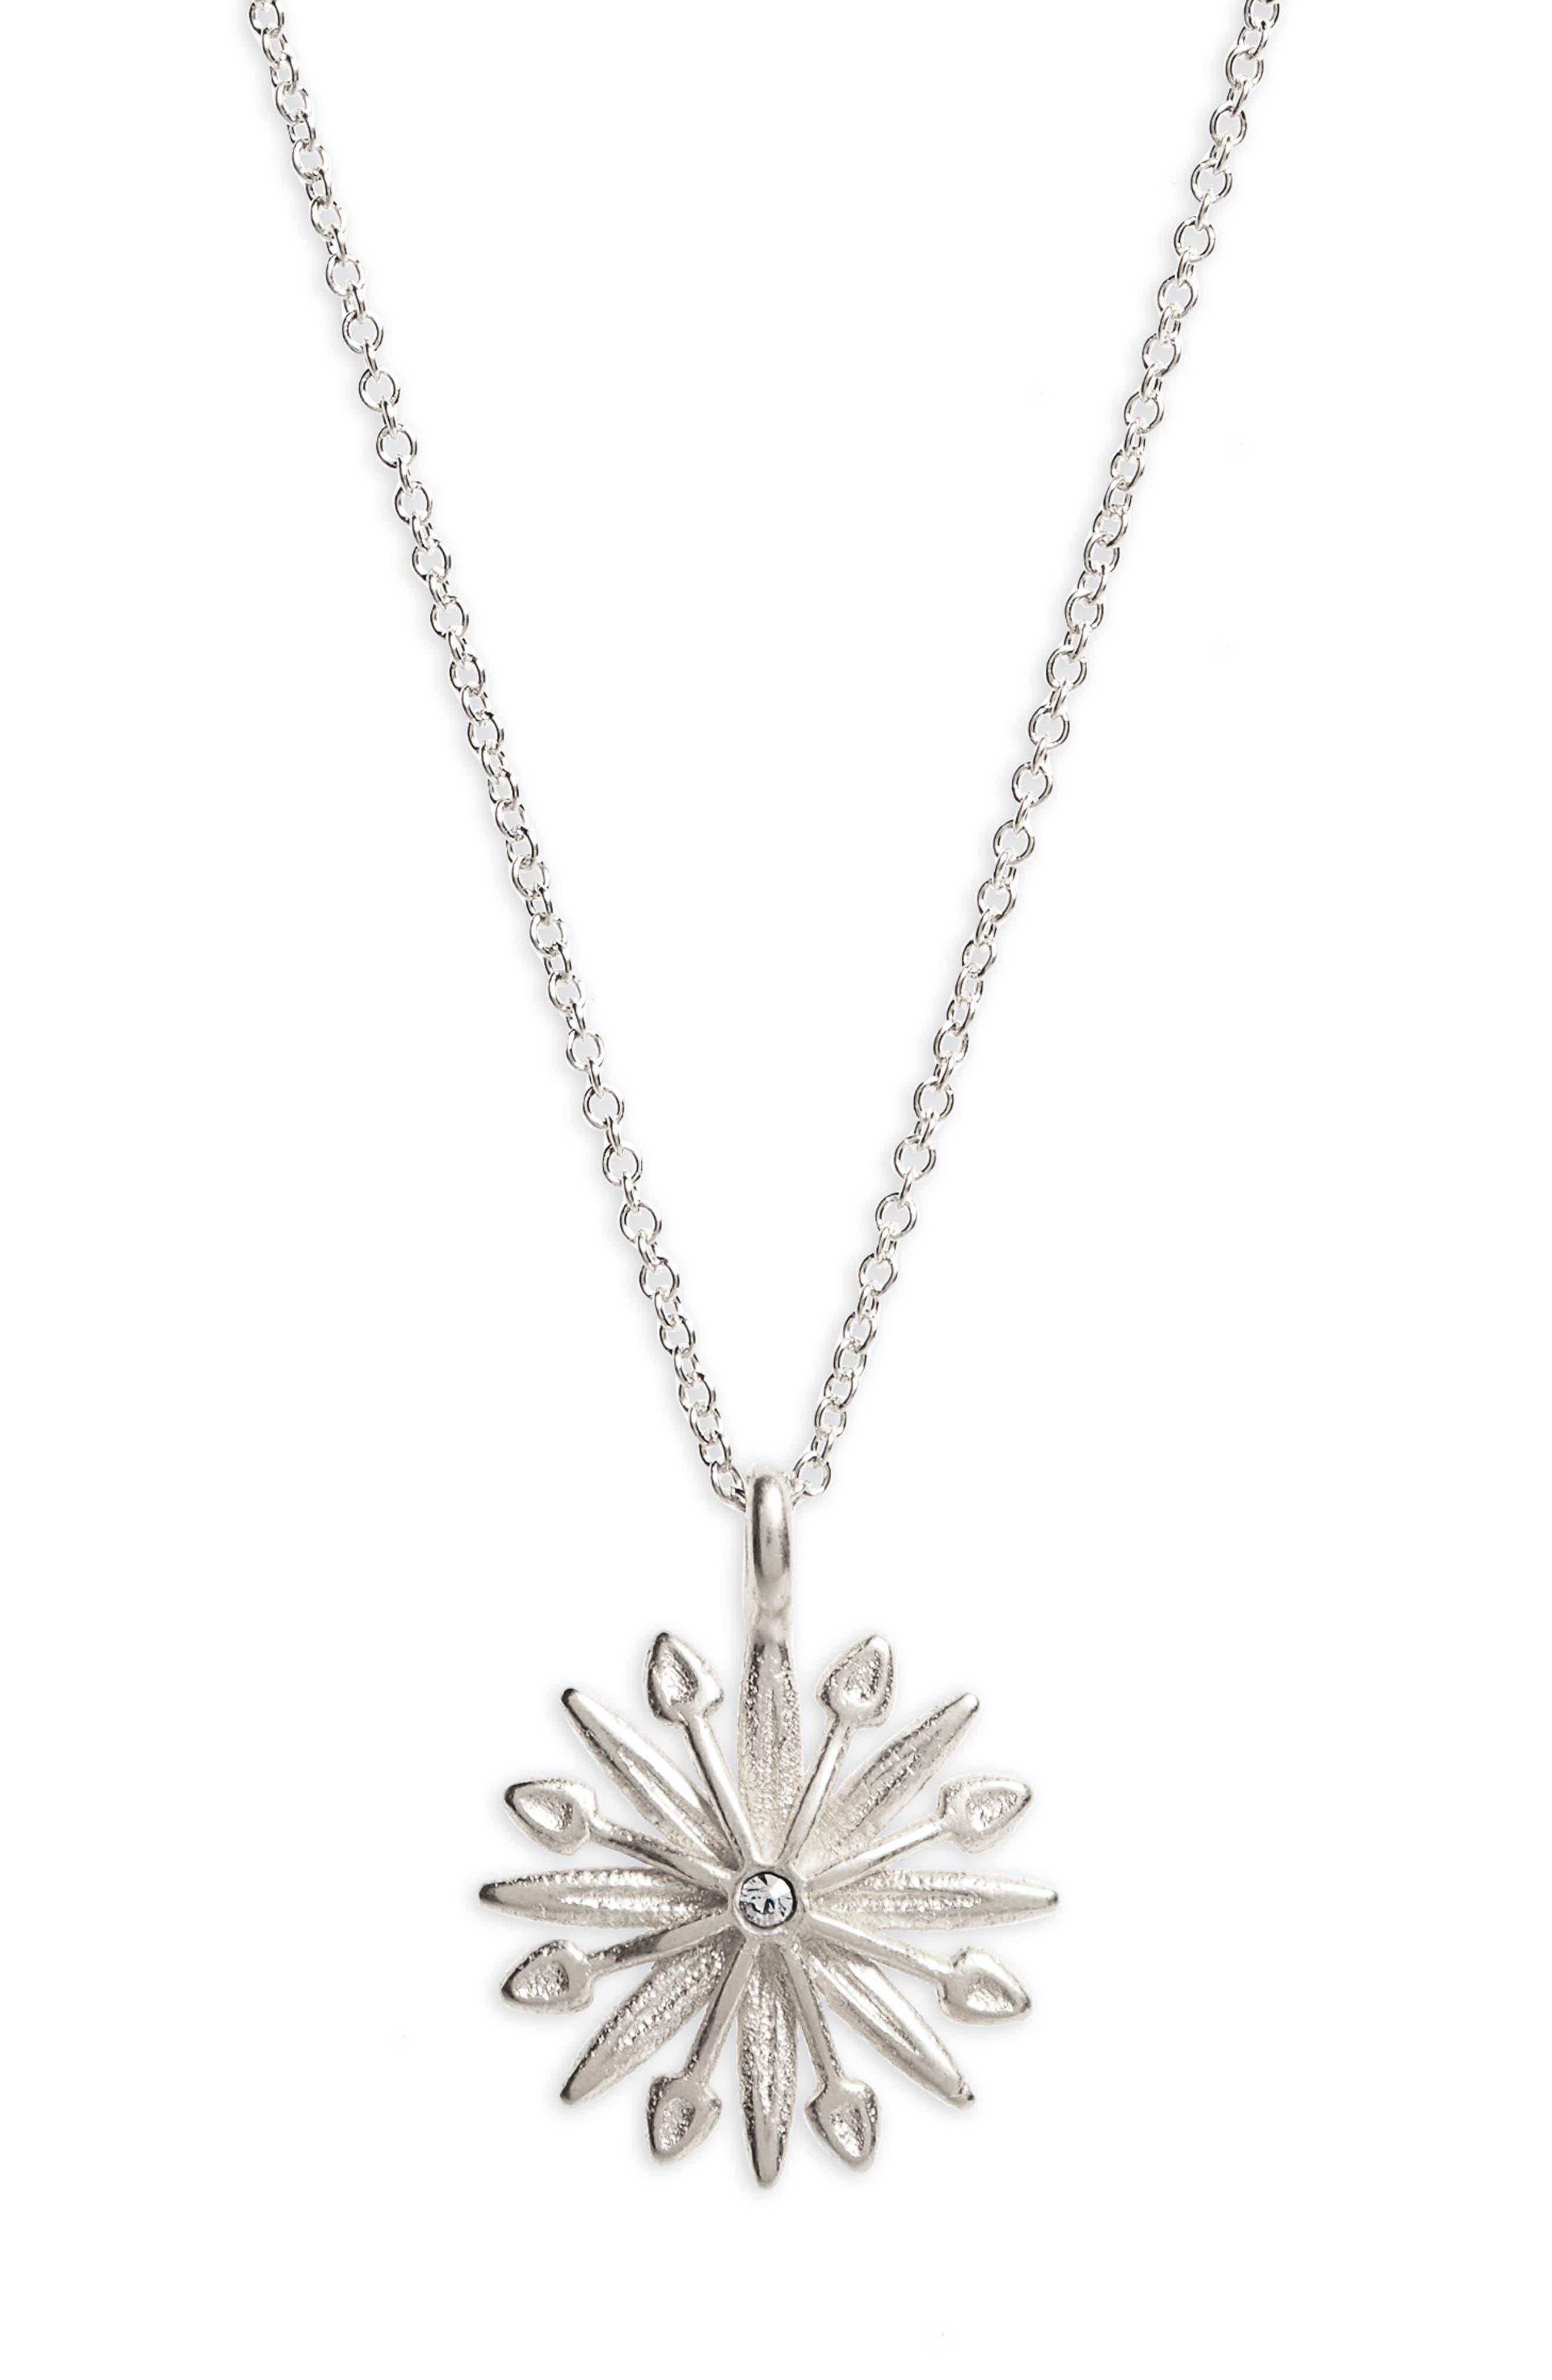 Starburst Charm Pendant Necklace,                             Alternate thumbnail 3, color,                             Silver